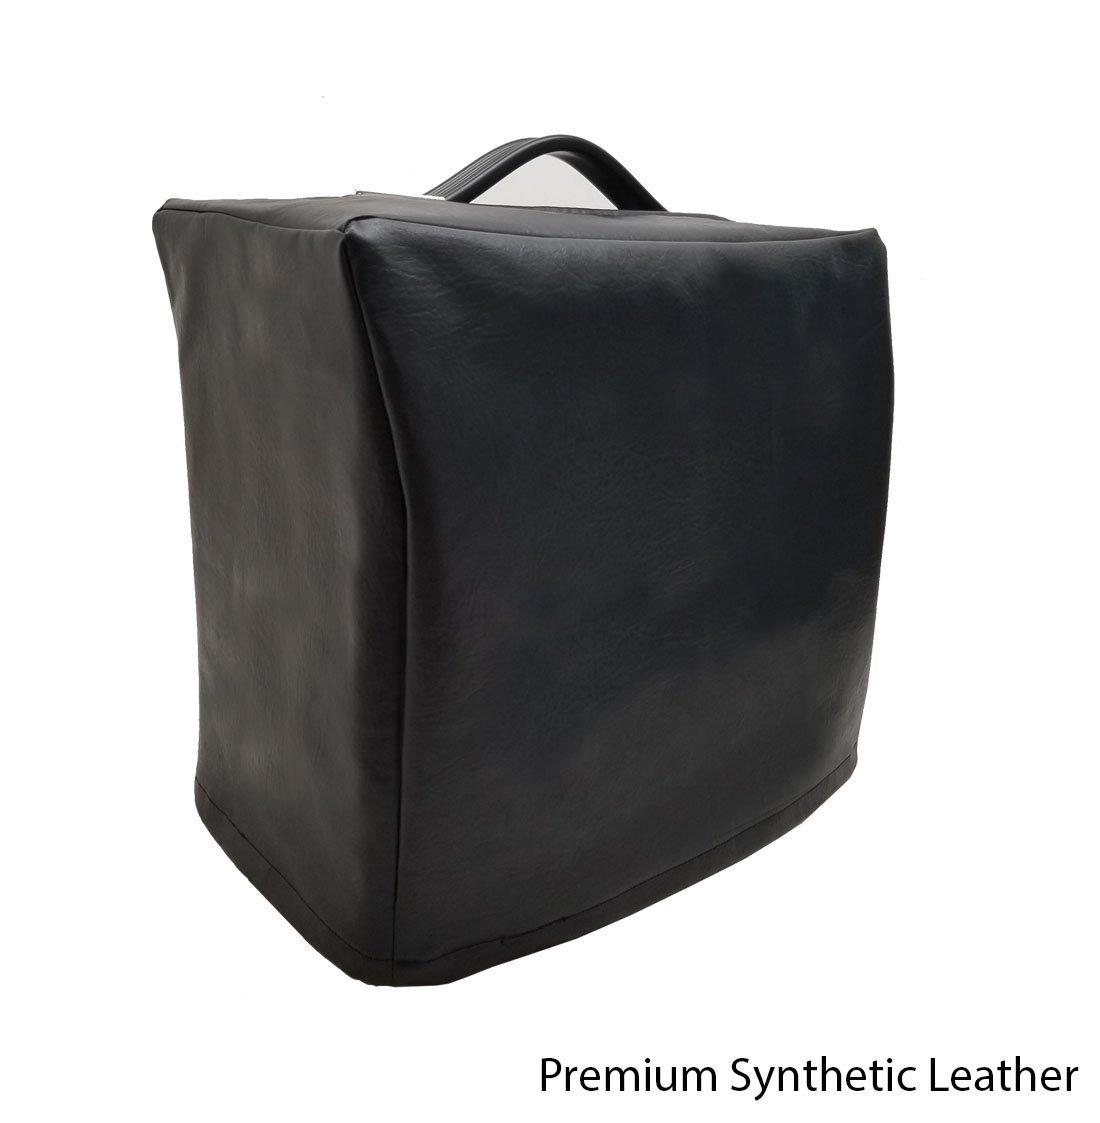 DCFY Guitar Amplifier Dust Covers for Blackstar HT Venue Studio 20 | Premium Polyester